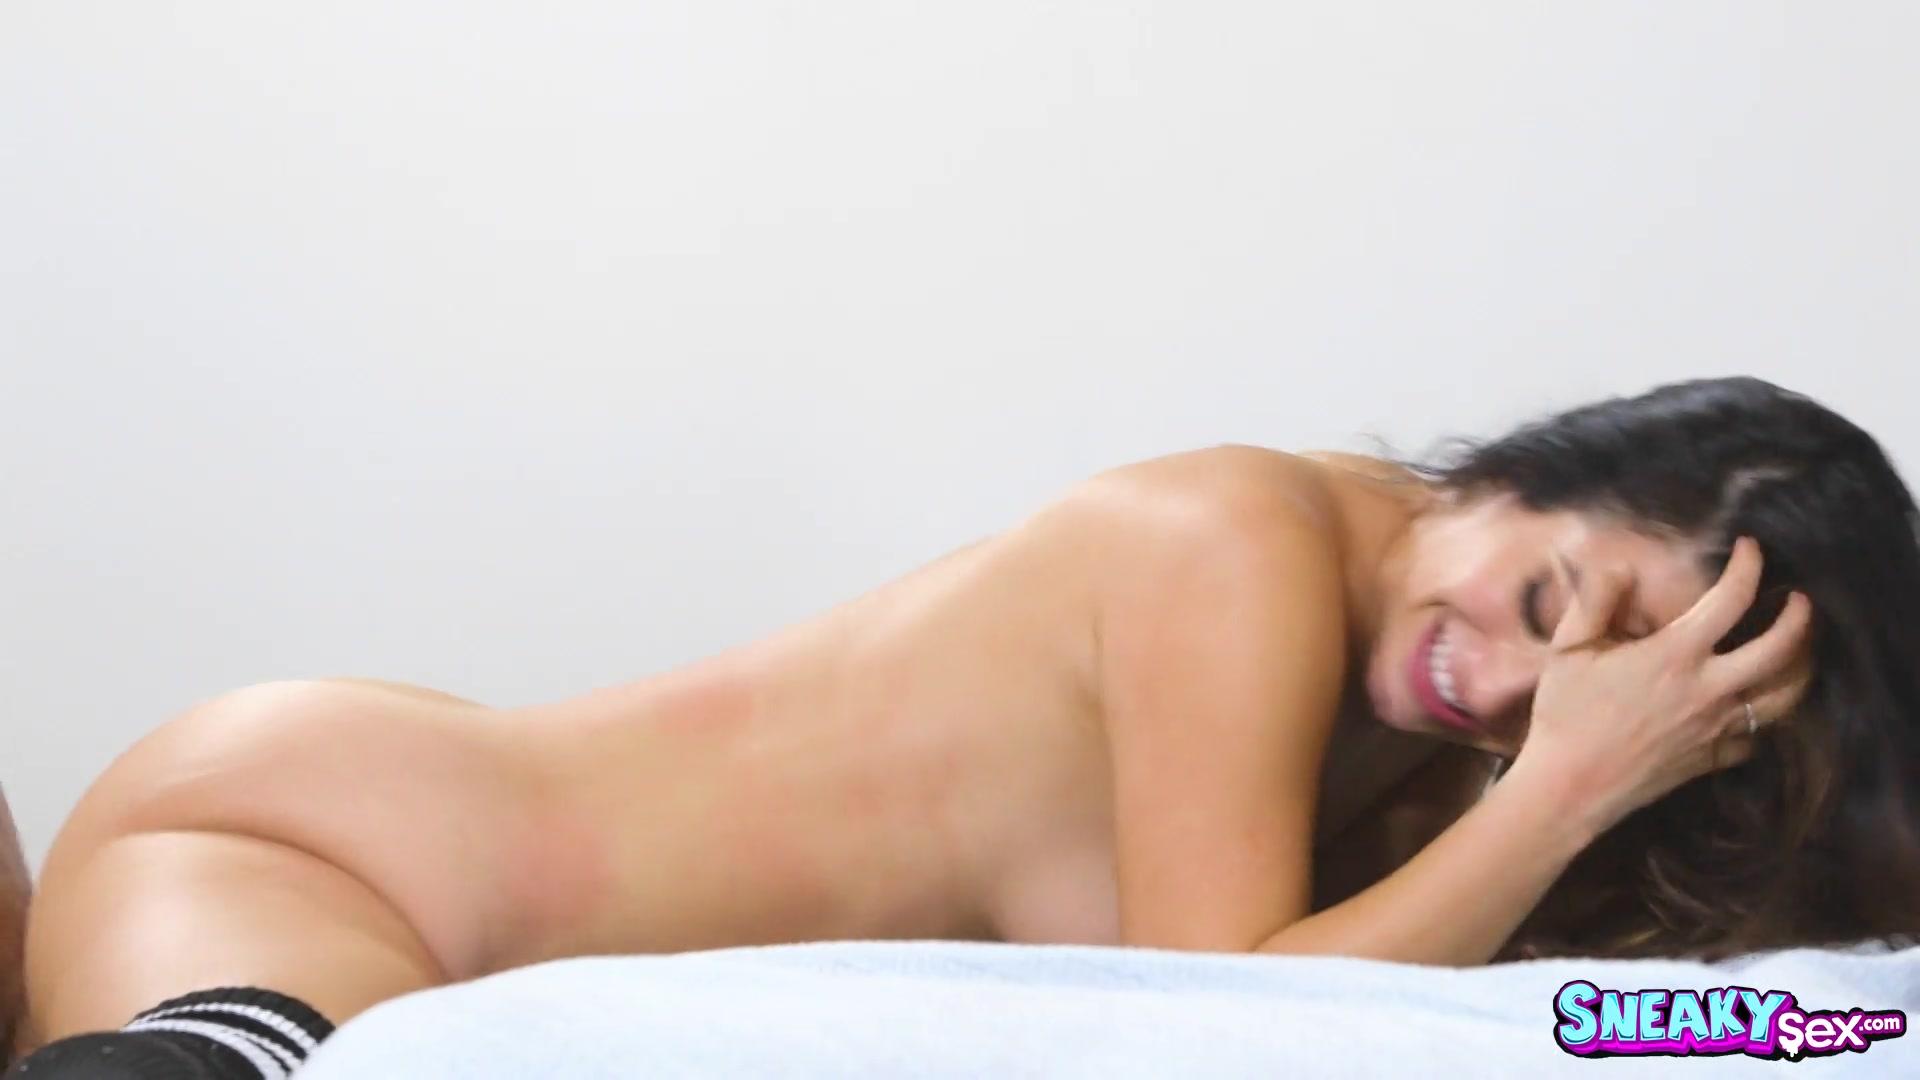 Sneaky sex.com